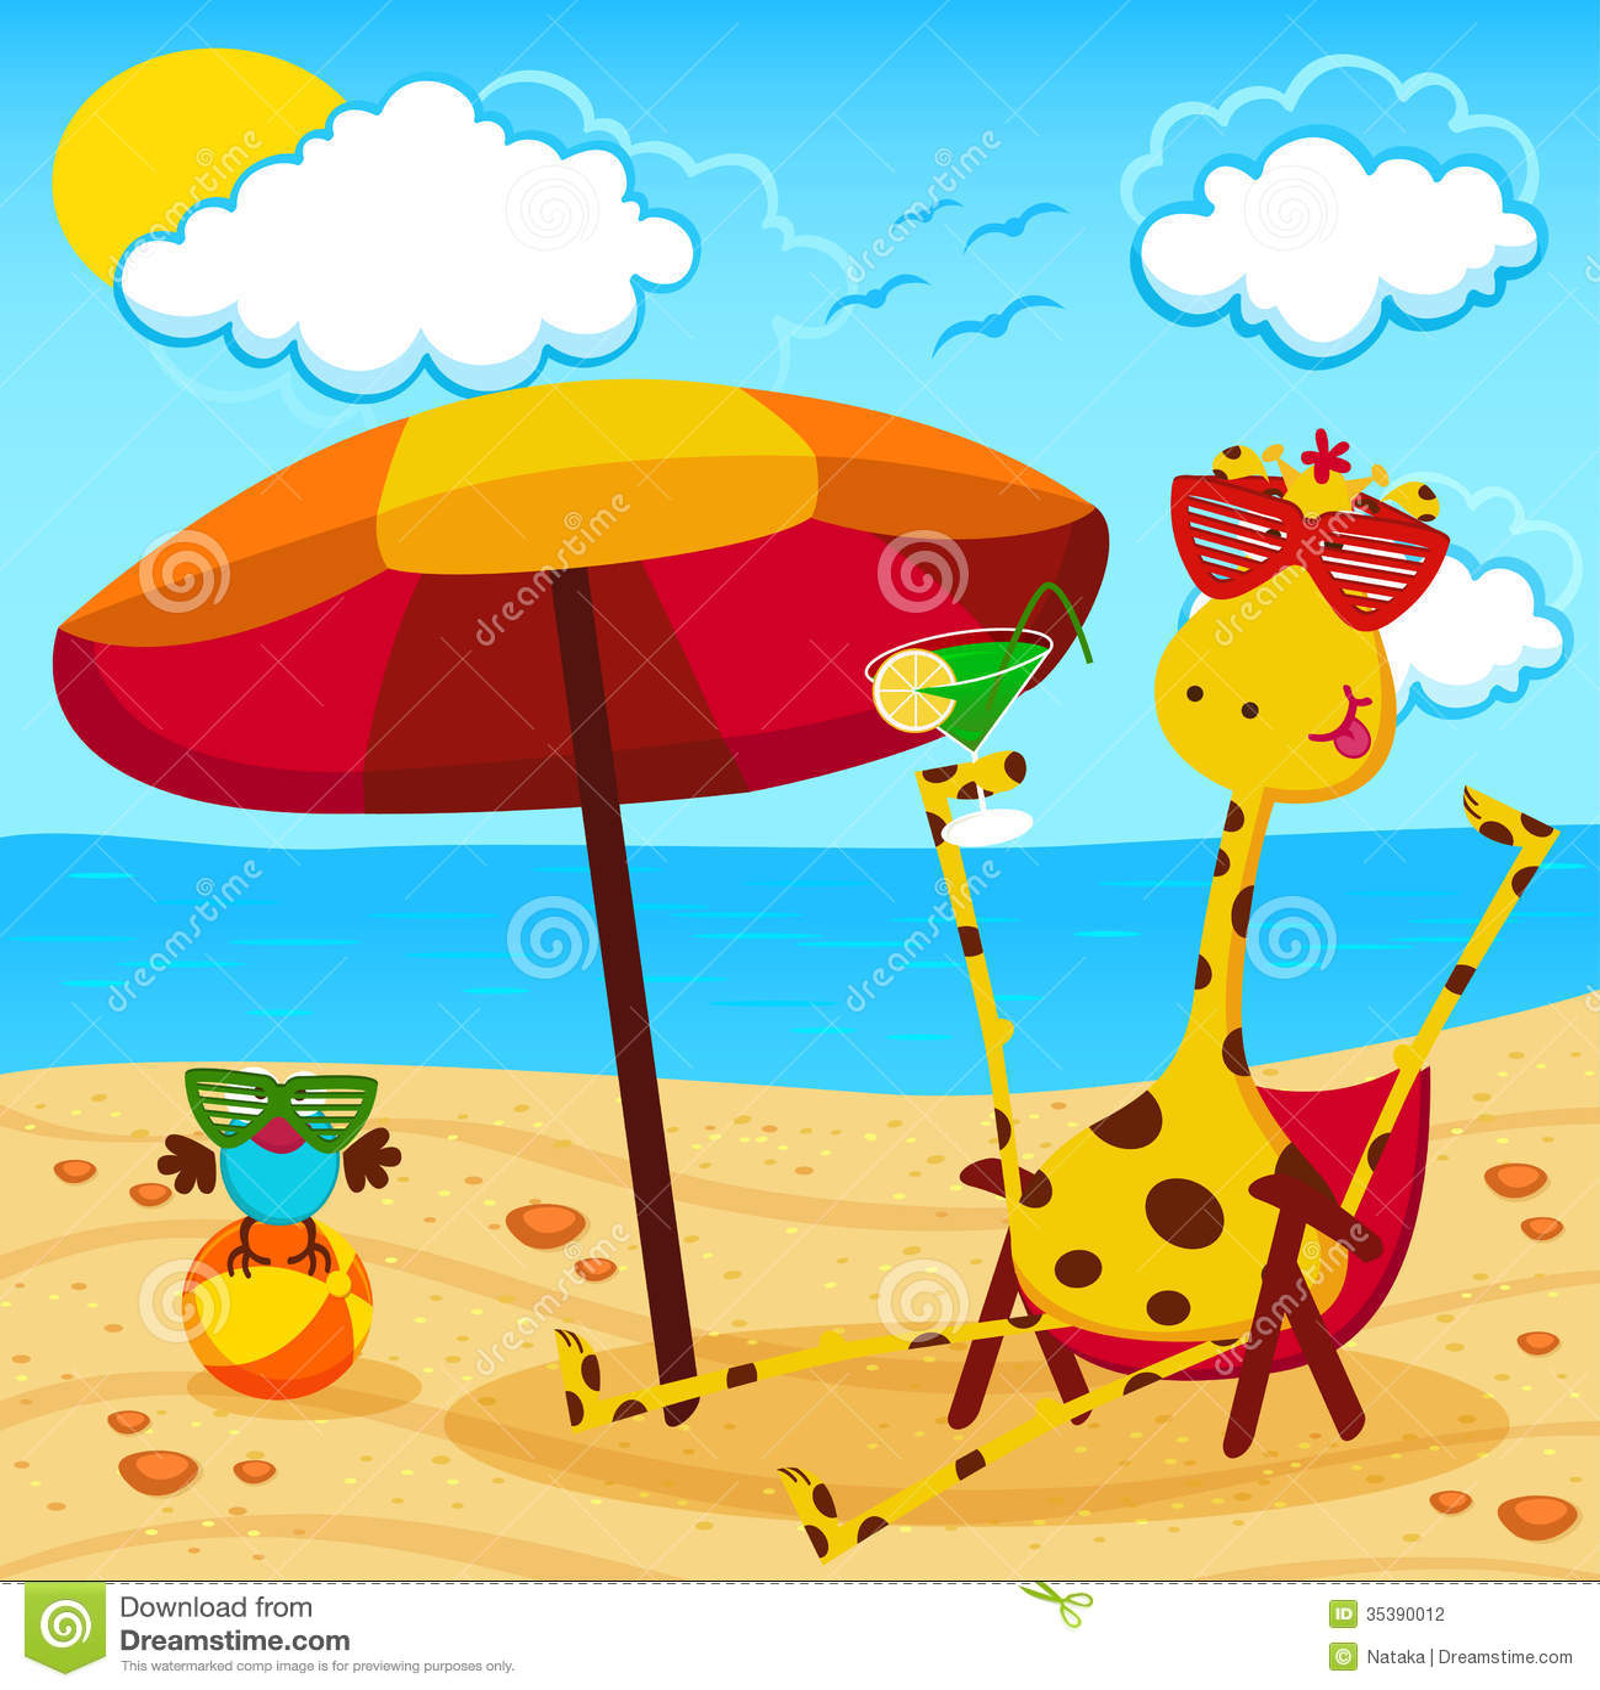 Giraffe And A Bird On The Beach Stock Vector Image